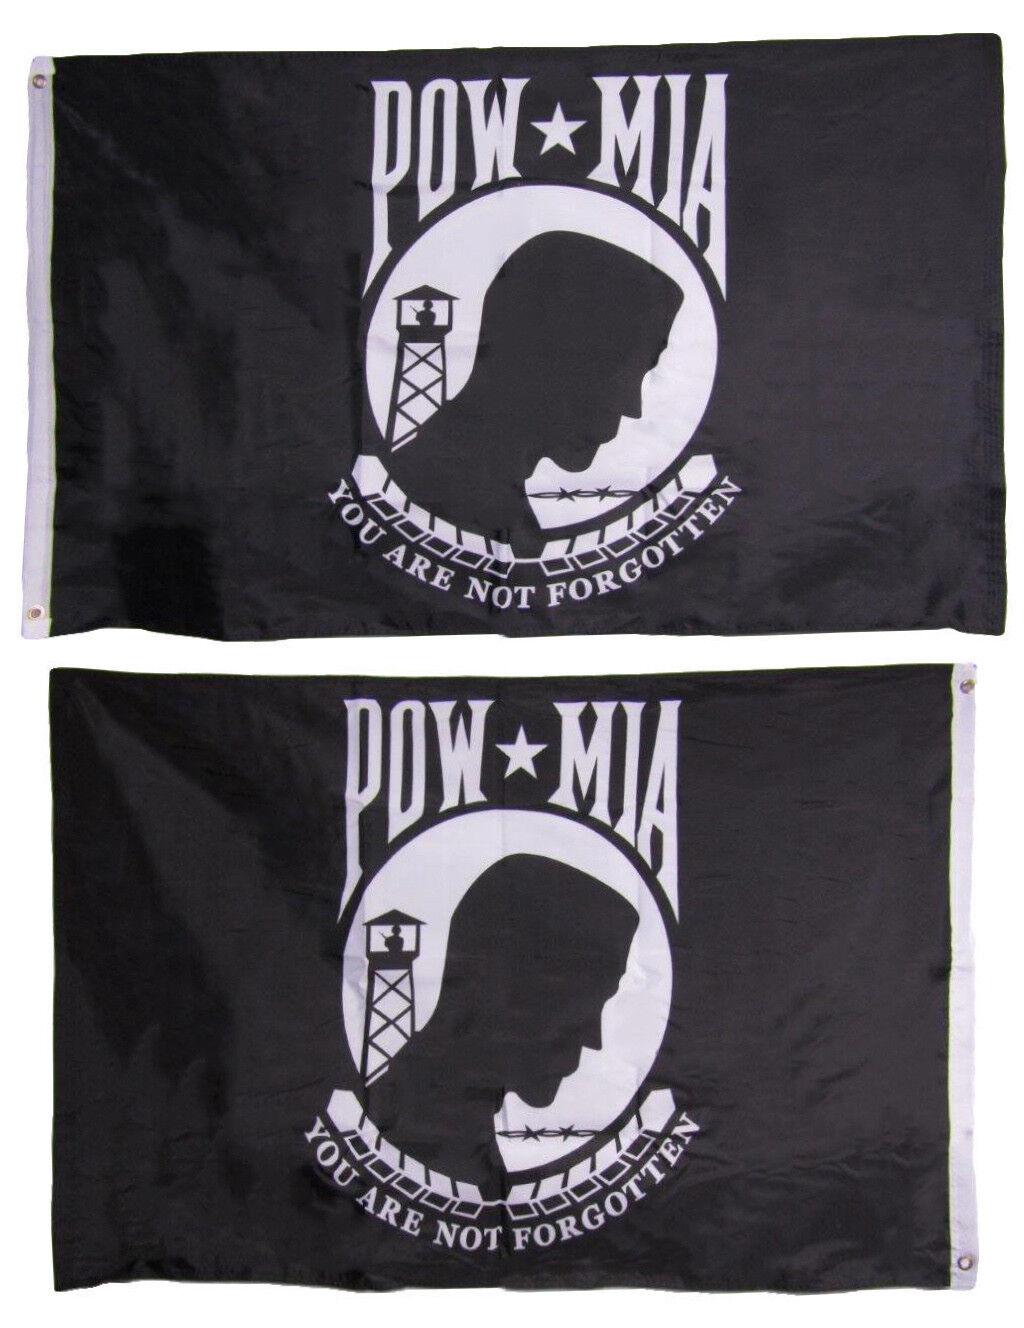 3x5 POW MIA Prisoner of War Heavy Duty Polyester Nylon 200D